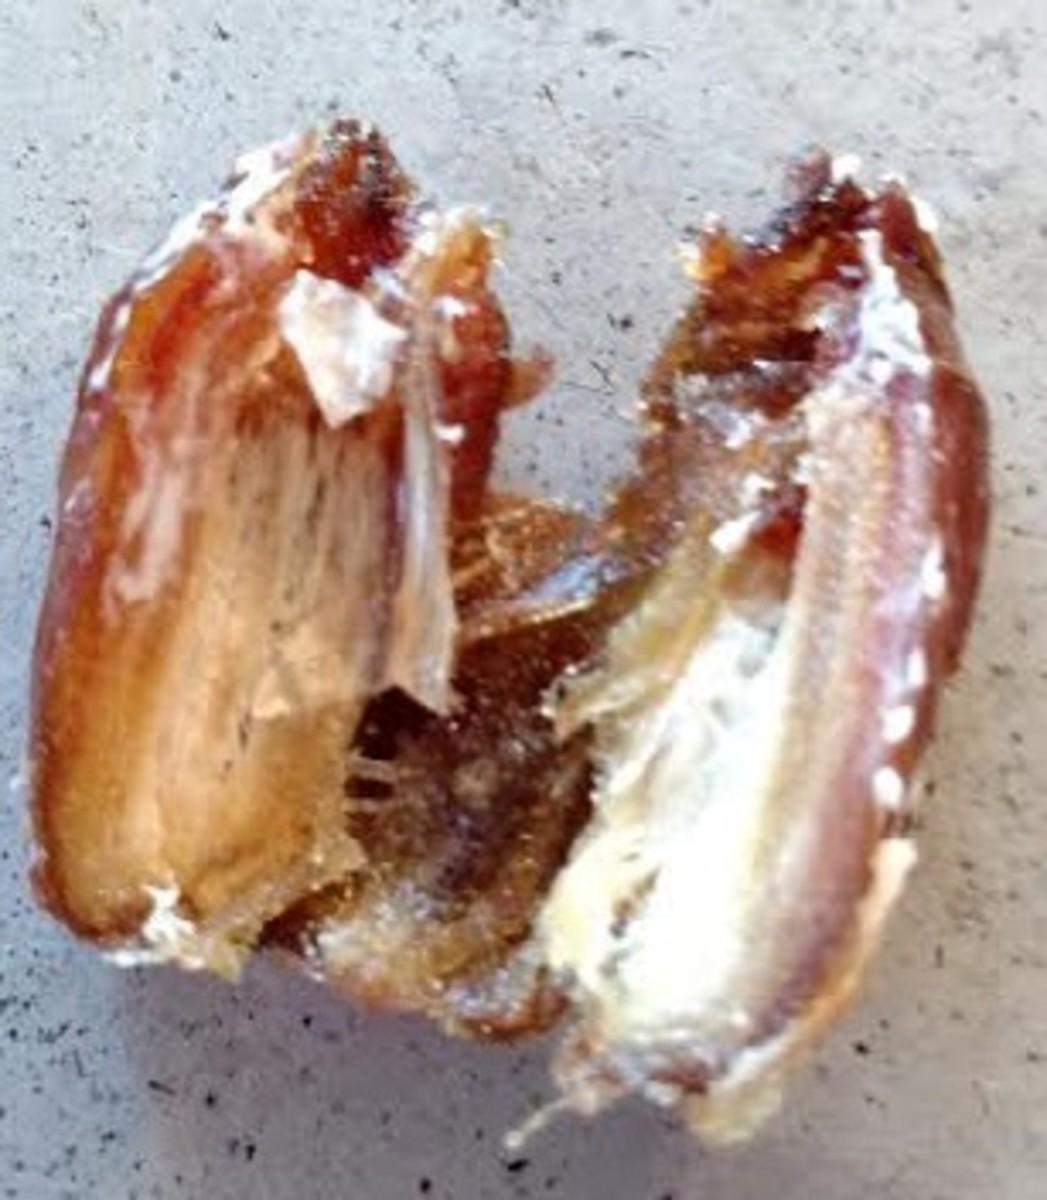 Slice date or fig in half